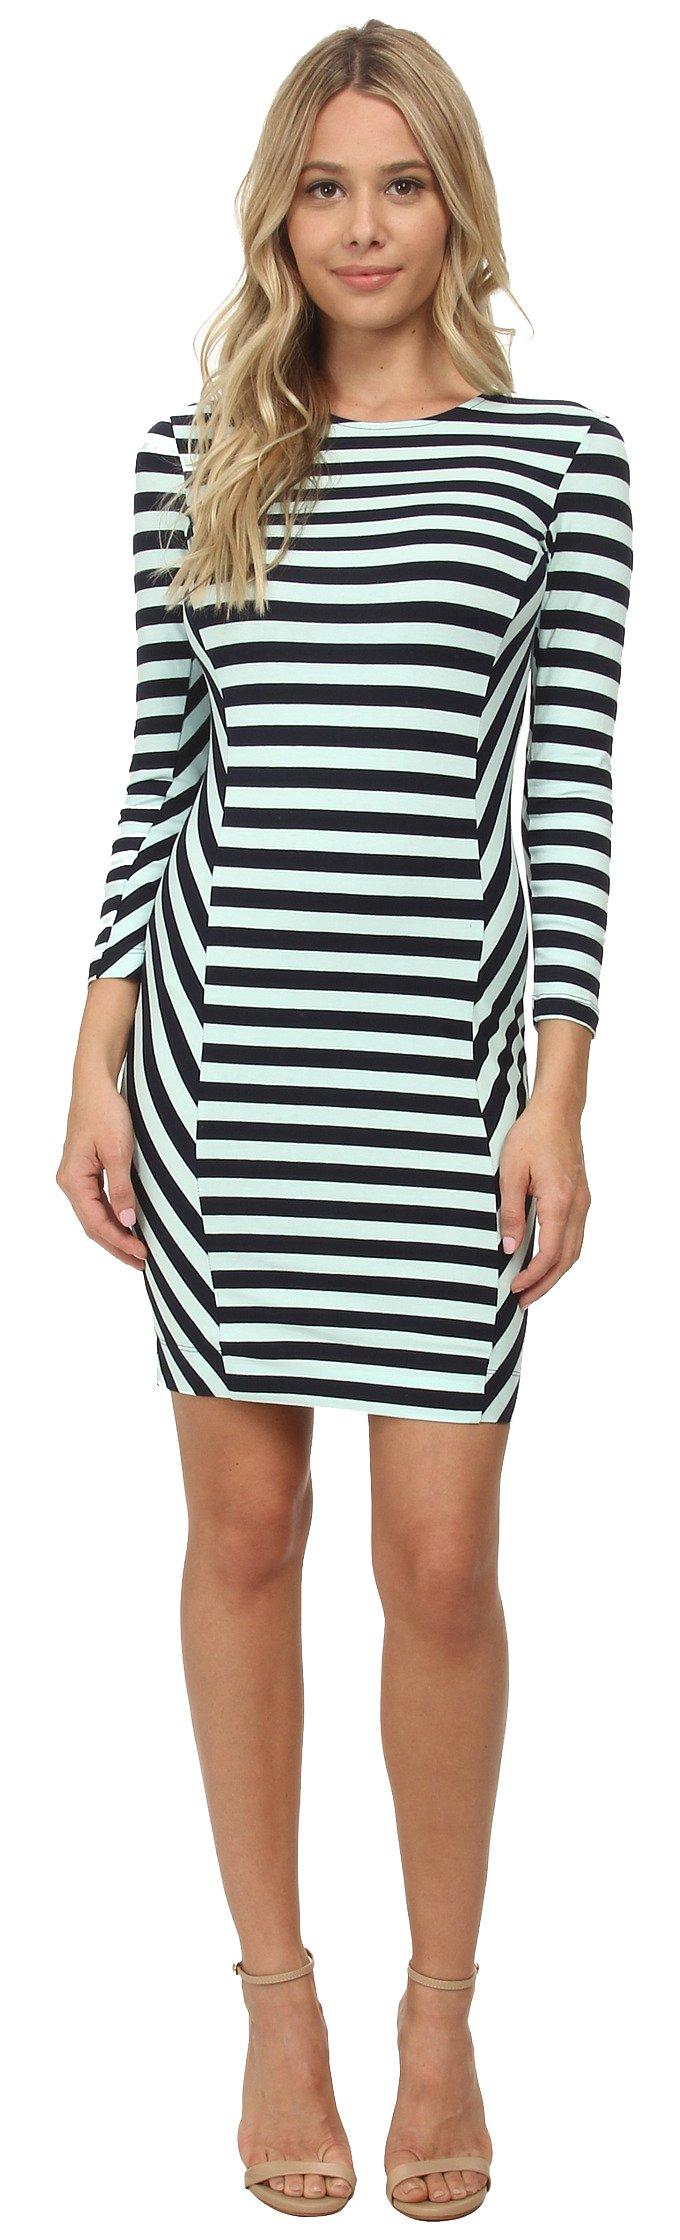 French Connection Women's Summer Stripe Dress, Nocturnal/Aqua Fresh, 2